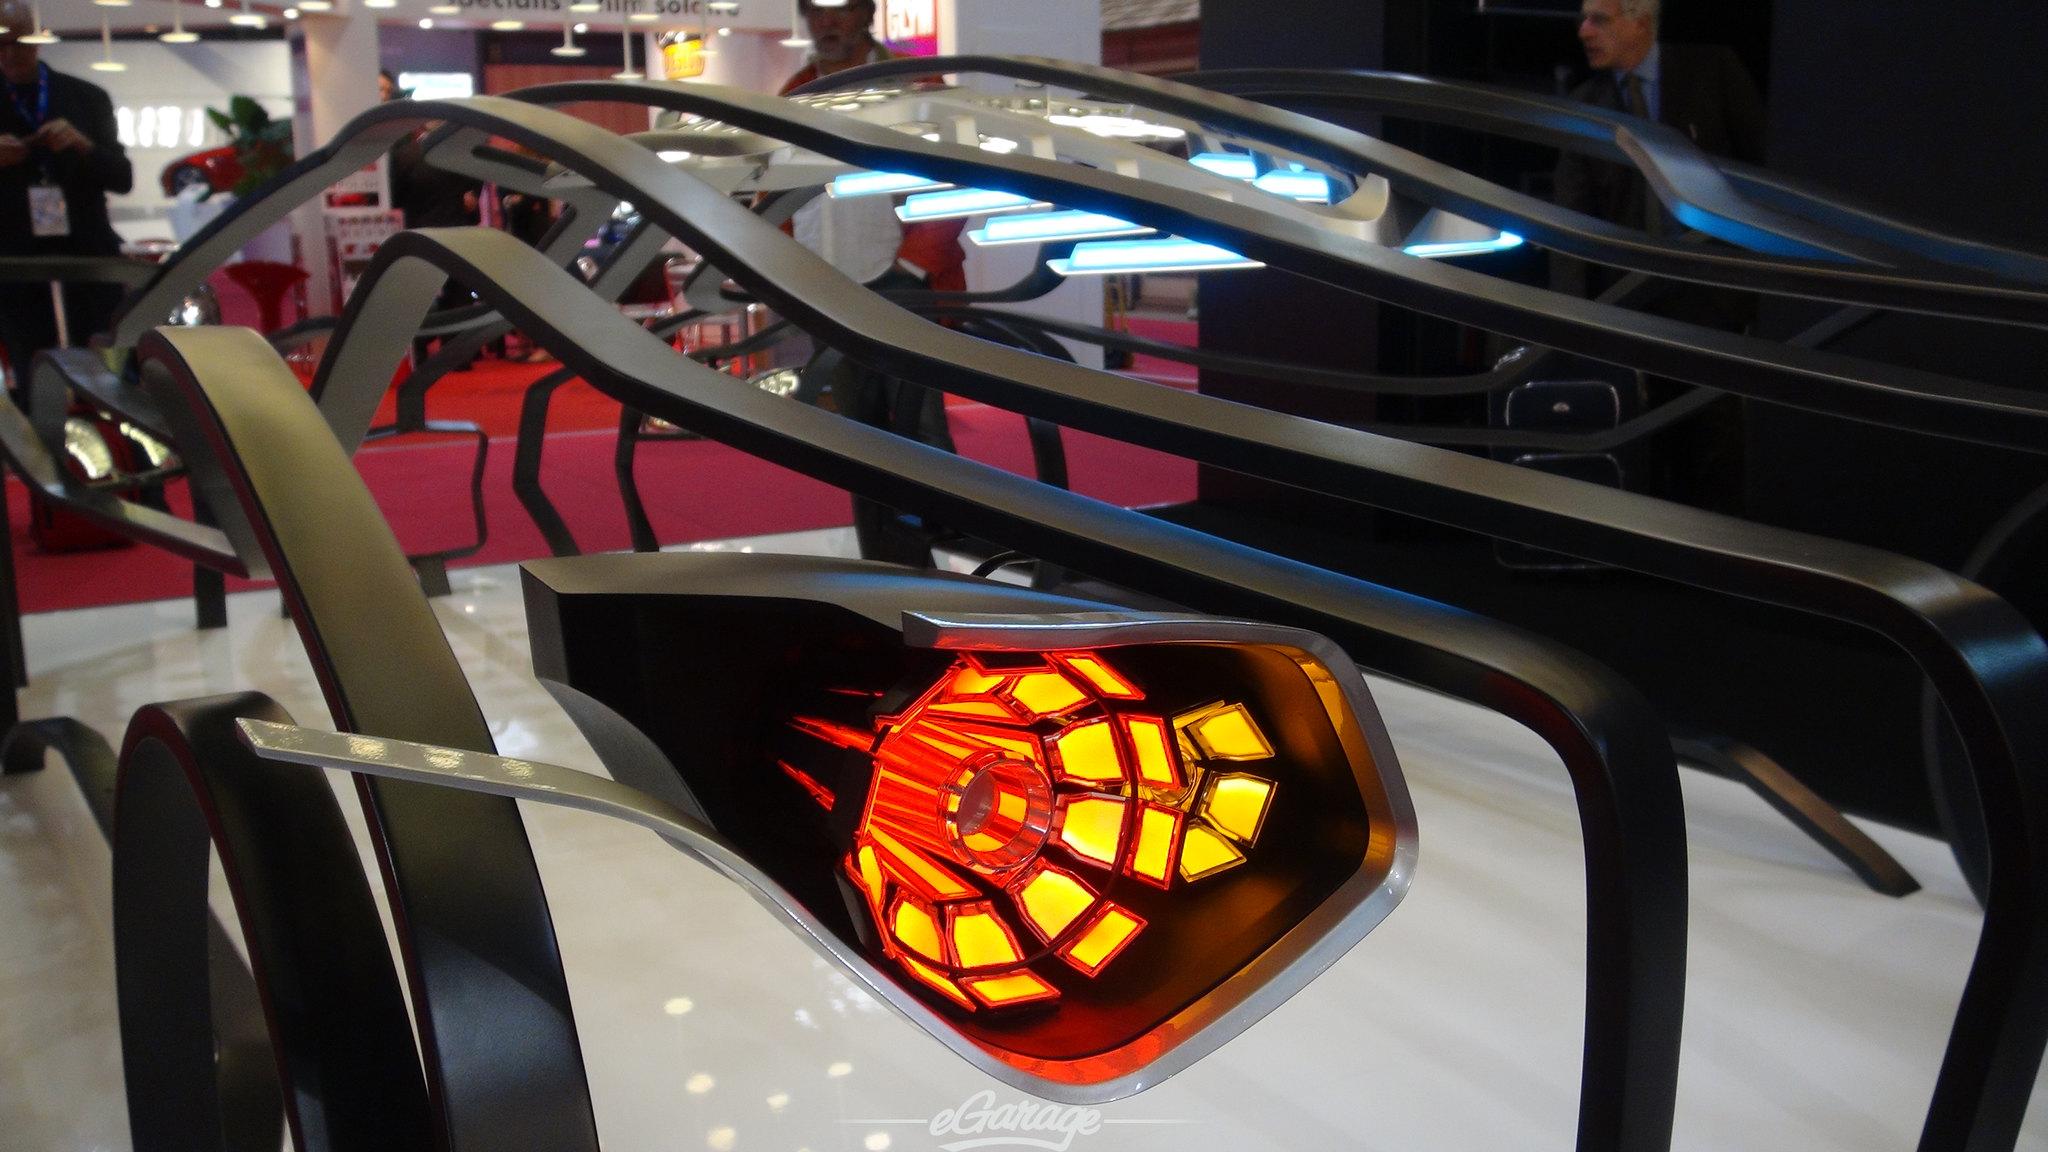 8030422148 dcce1f5b56 k 2012 Paris Motor Show